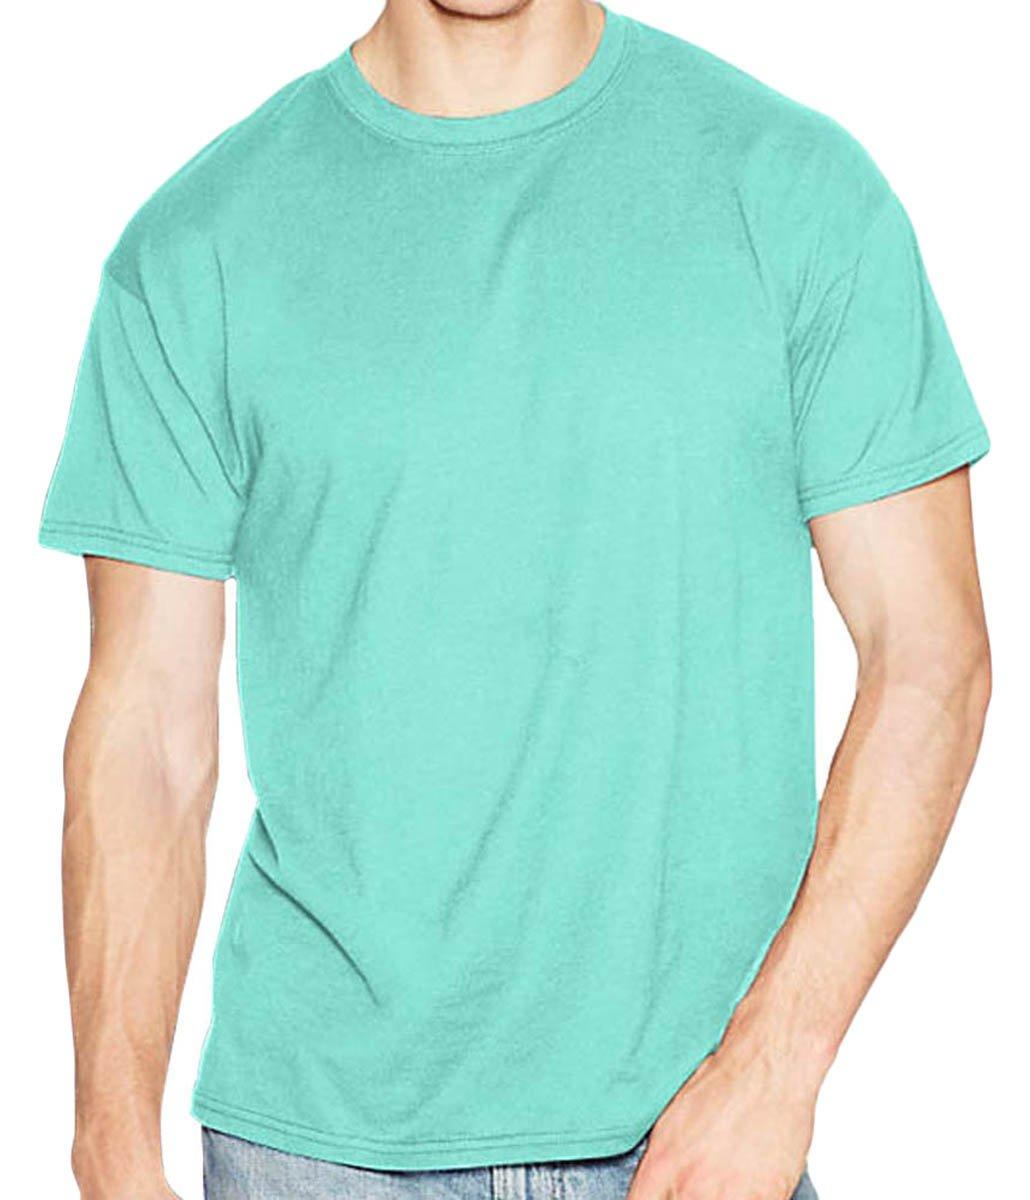 Hanes Men's X-Temp Crewneck Short-Sleeve T-Shirt (3X), Clean Mint